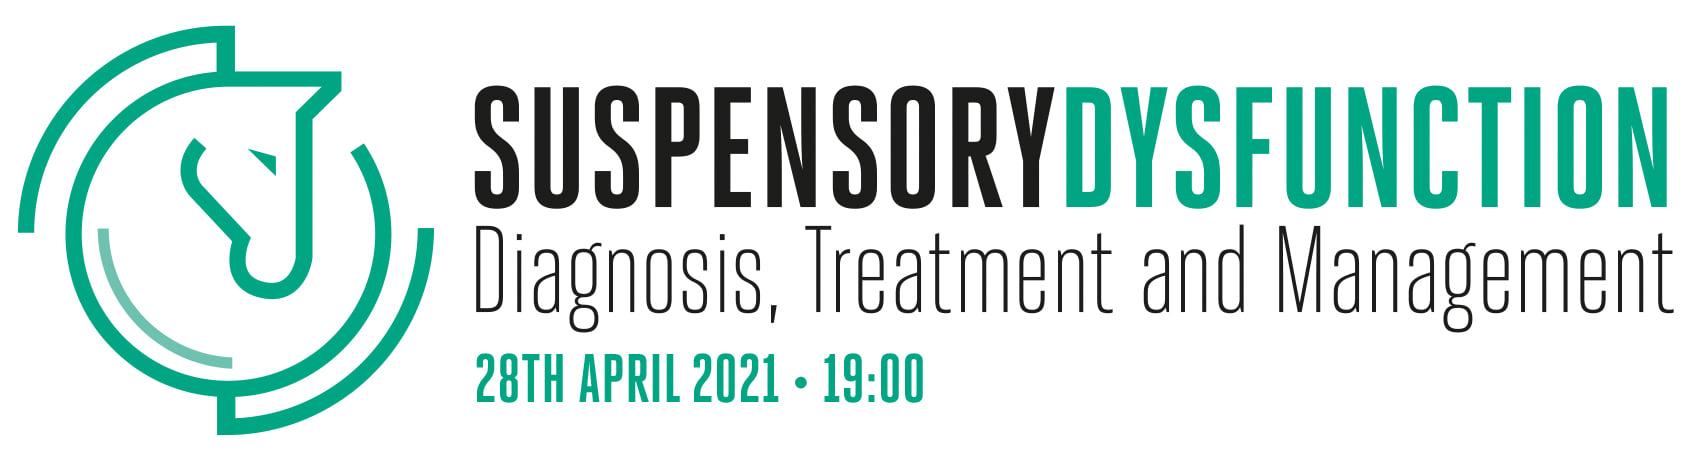 David Nicholls to take part in talk on suspensory dysfunctions.